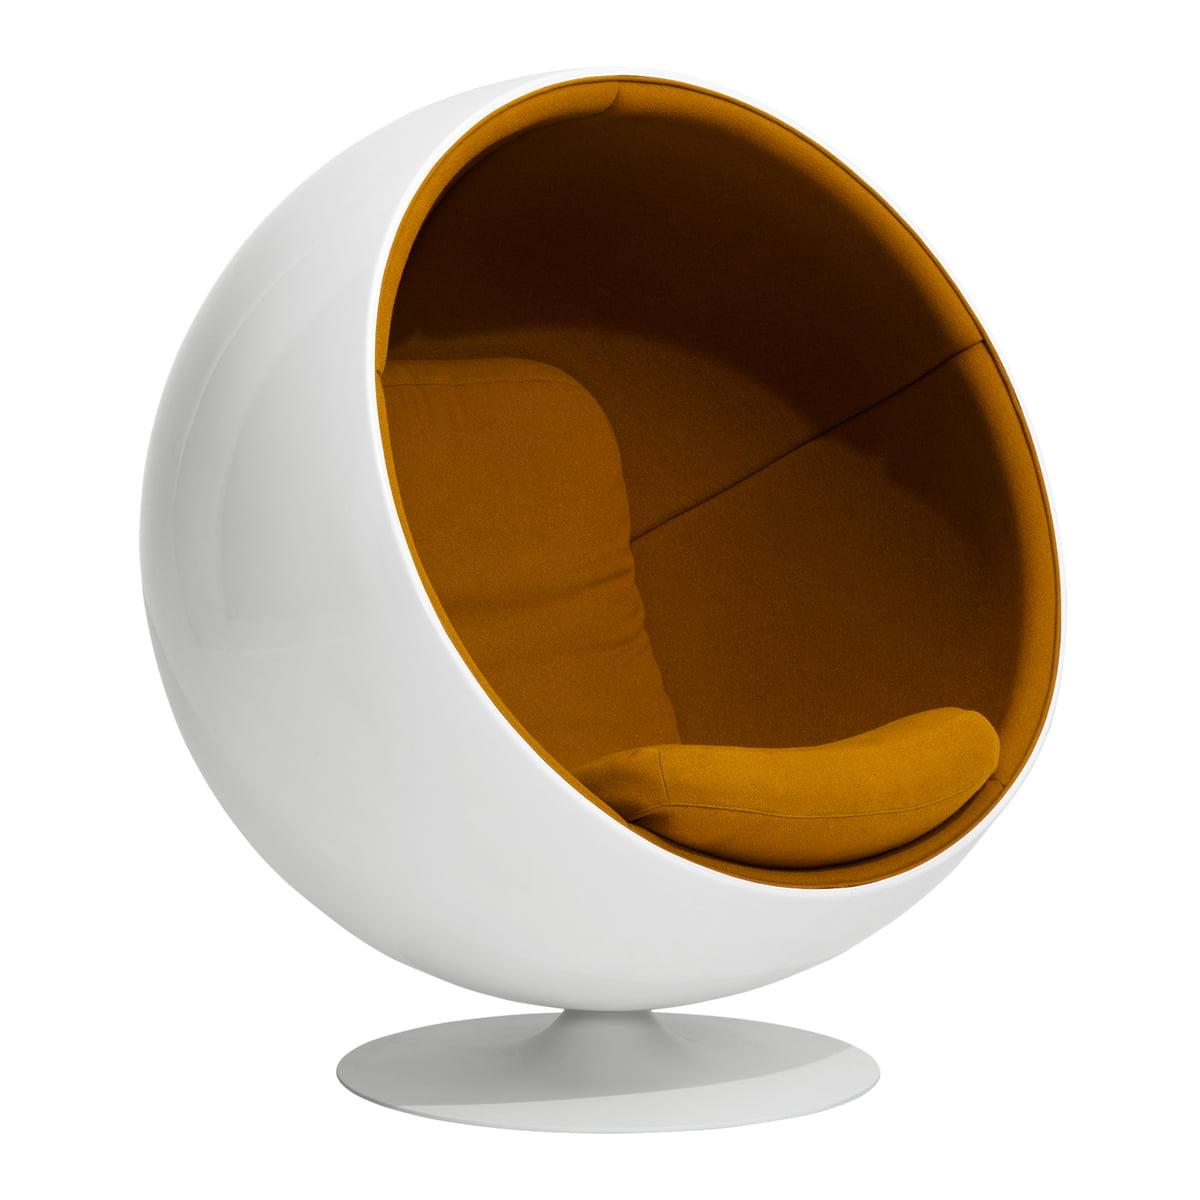 ball chair by eero aarnio originals connox. Black Bedroom Furniture Sets. Home Design Ideas